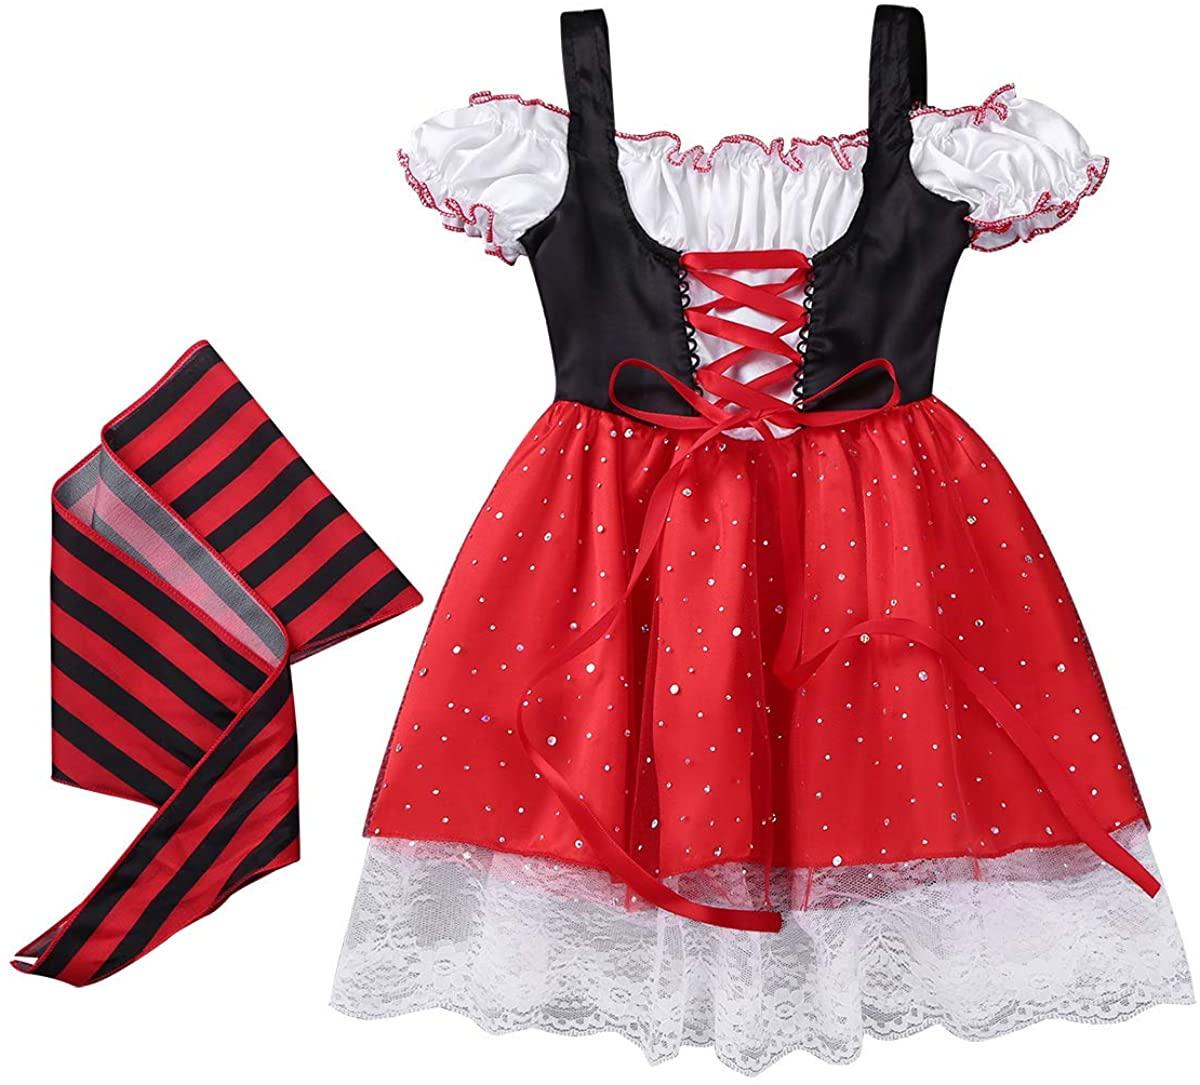 dPois Kids Girls Pirate Costumes Princess Halloween Fancy Dress with Head Scarf Wristband 3PCS Set